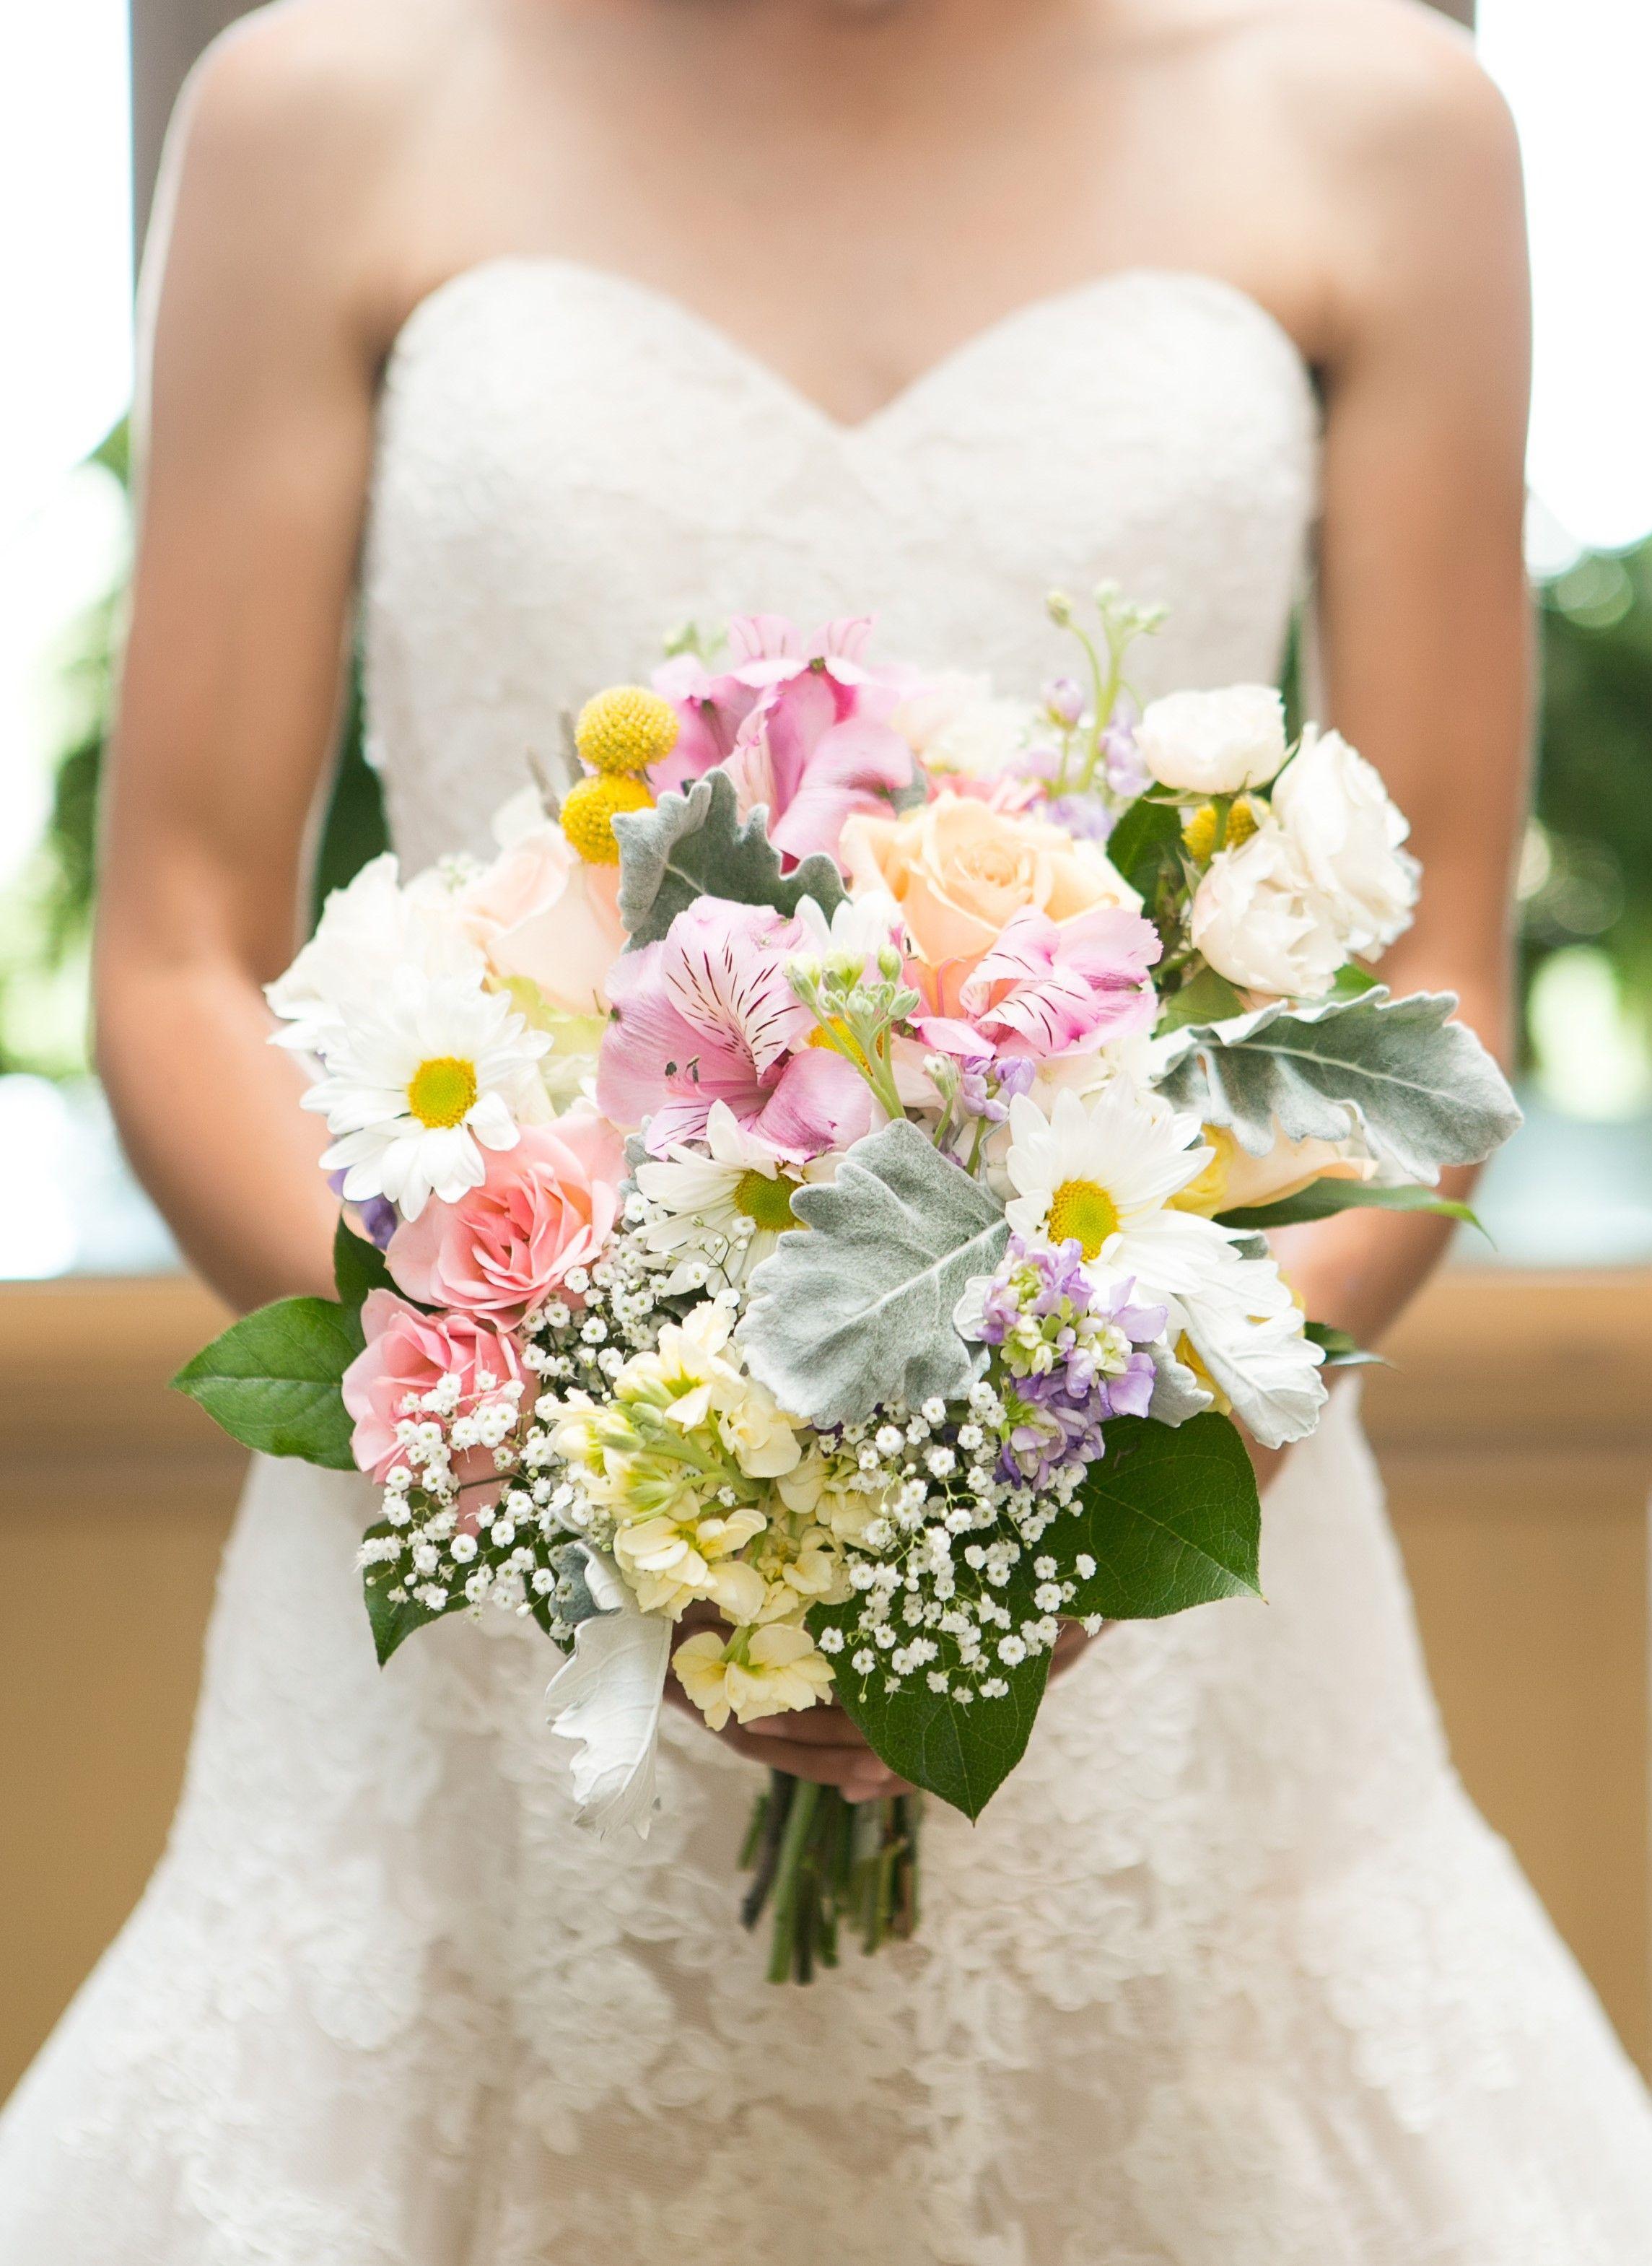 Summer Garden Bridal Bouquet With White Daisies Babies S Breath